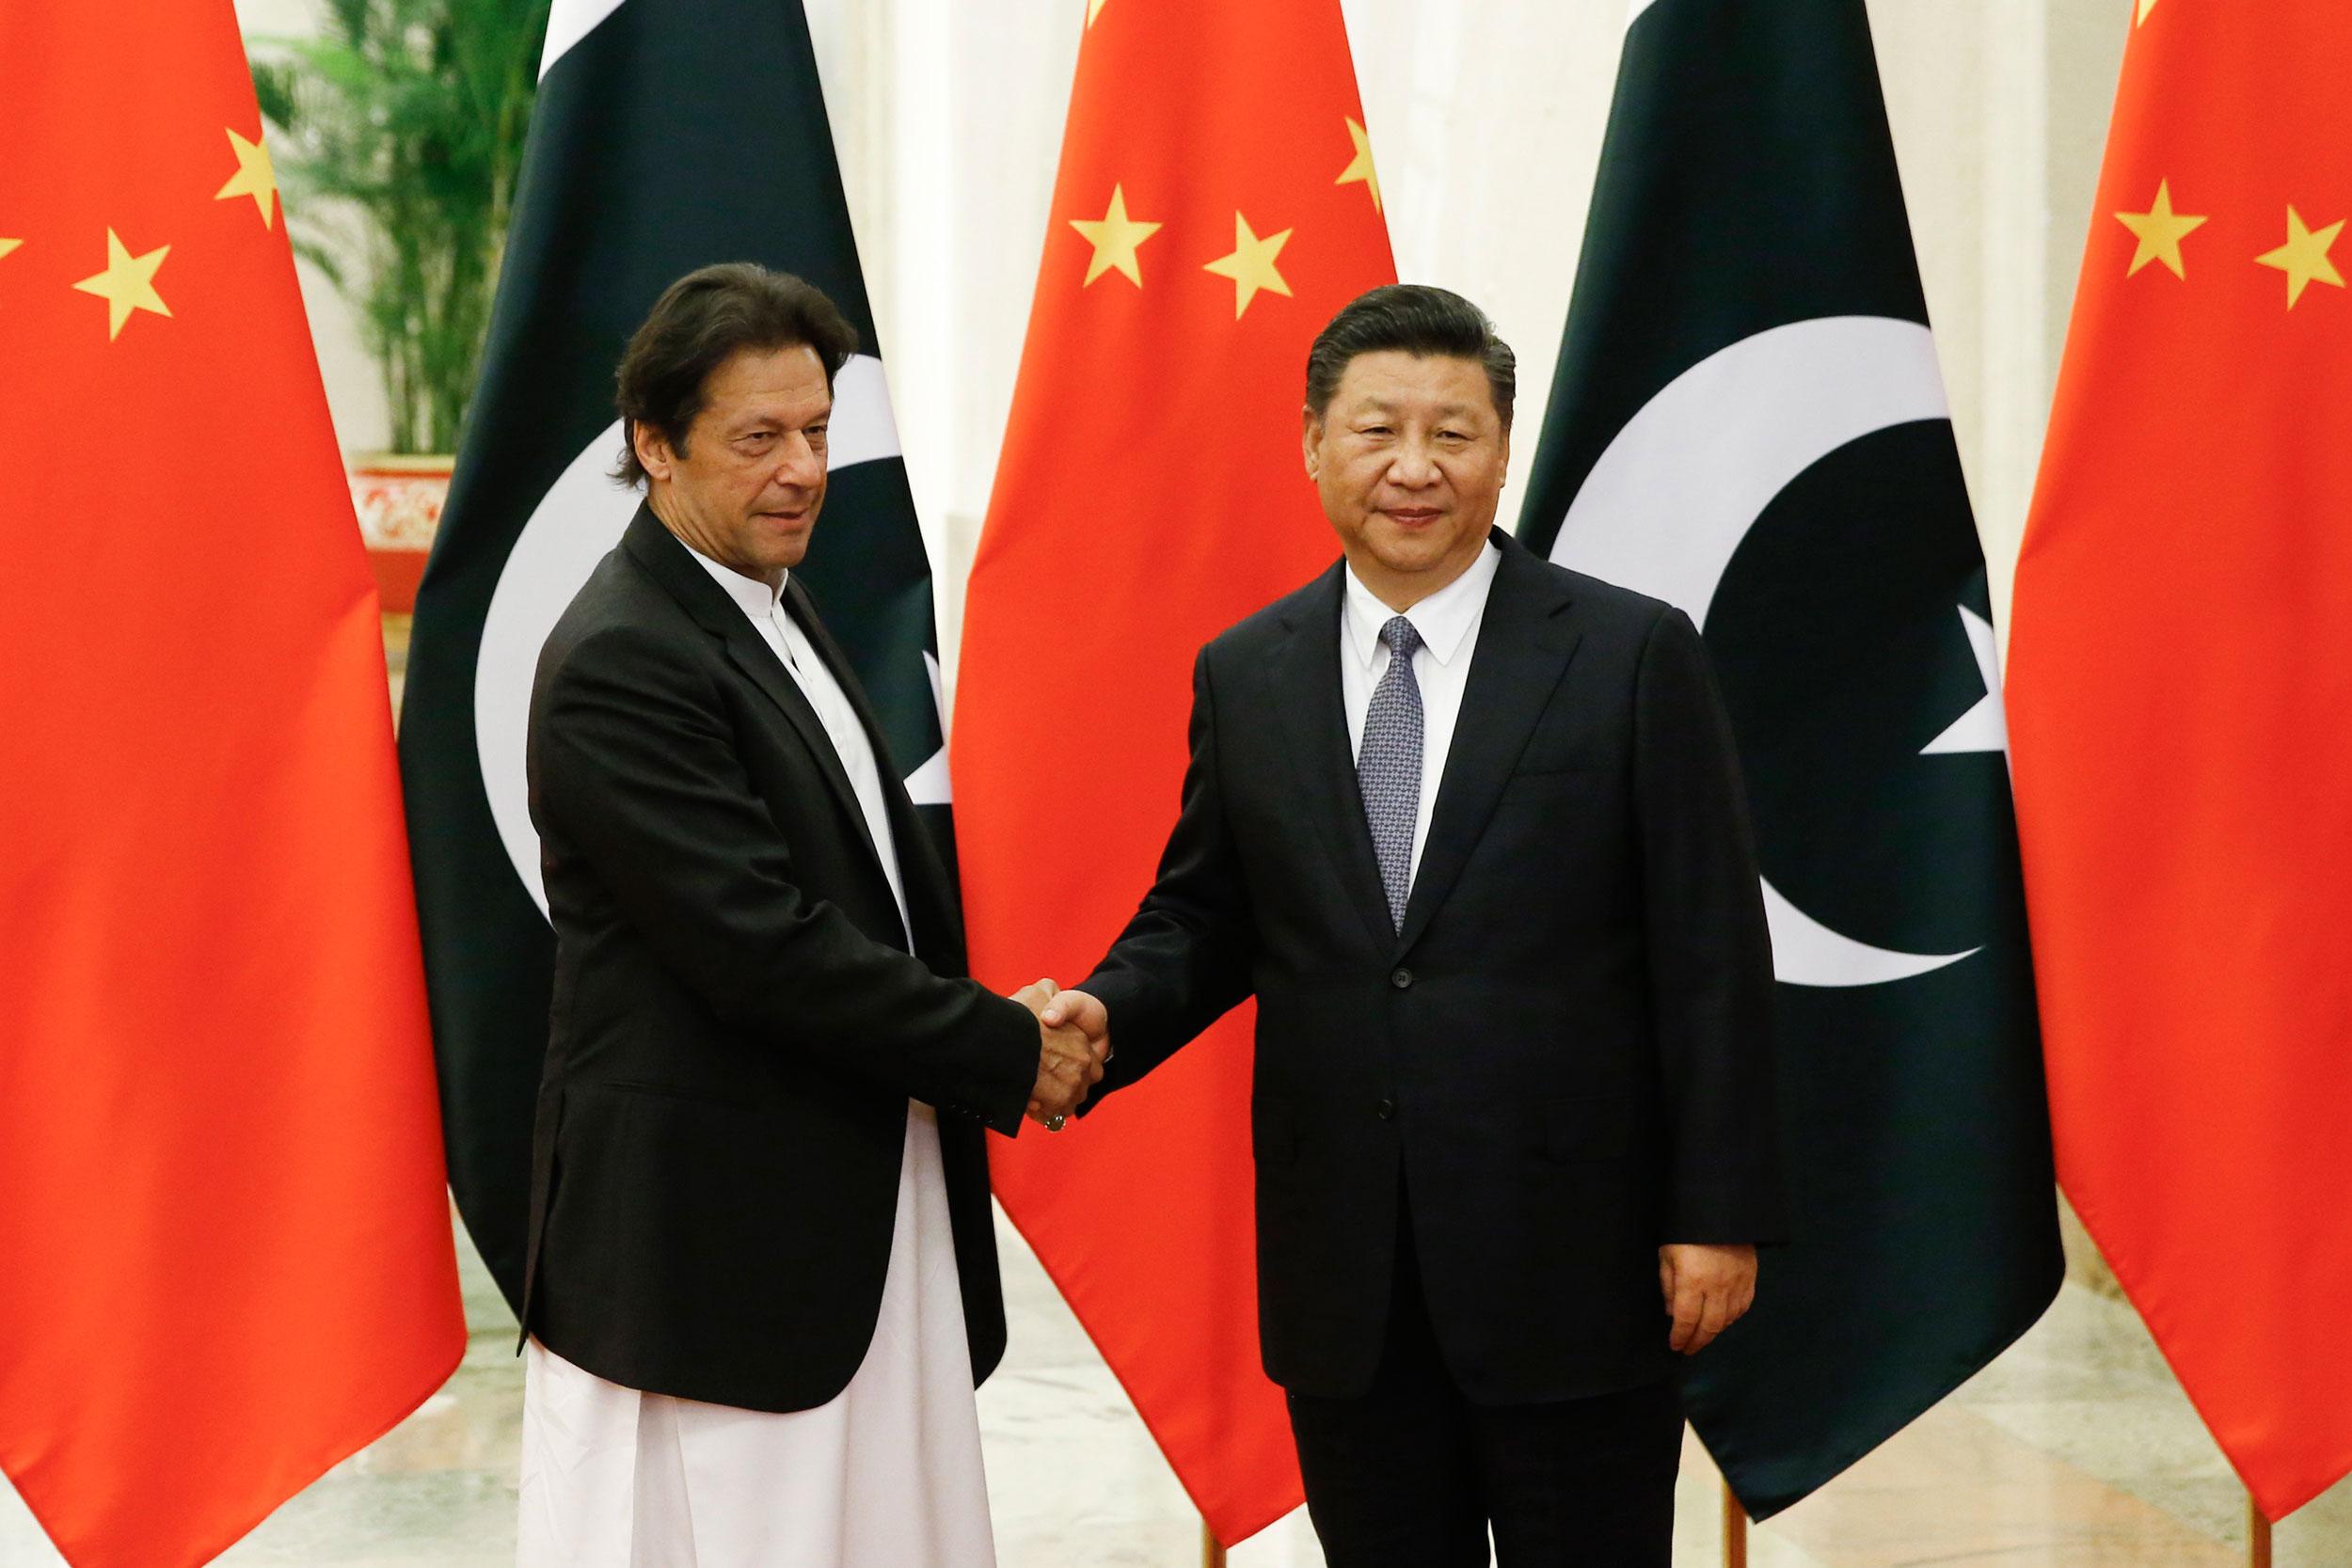 China's President Xi Jinping (right) meets Pakistan's Prime Minister Imran Khan.